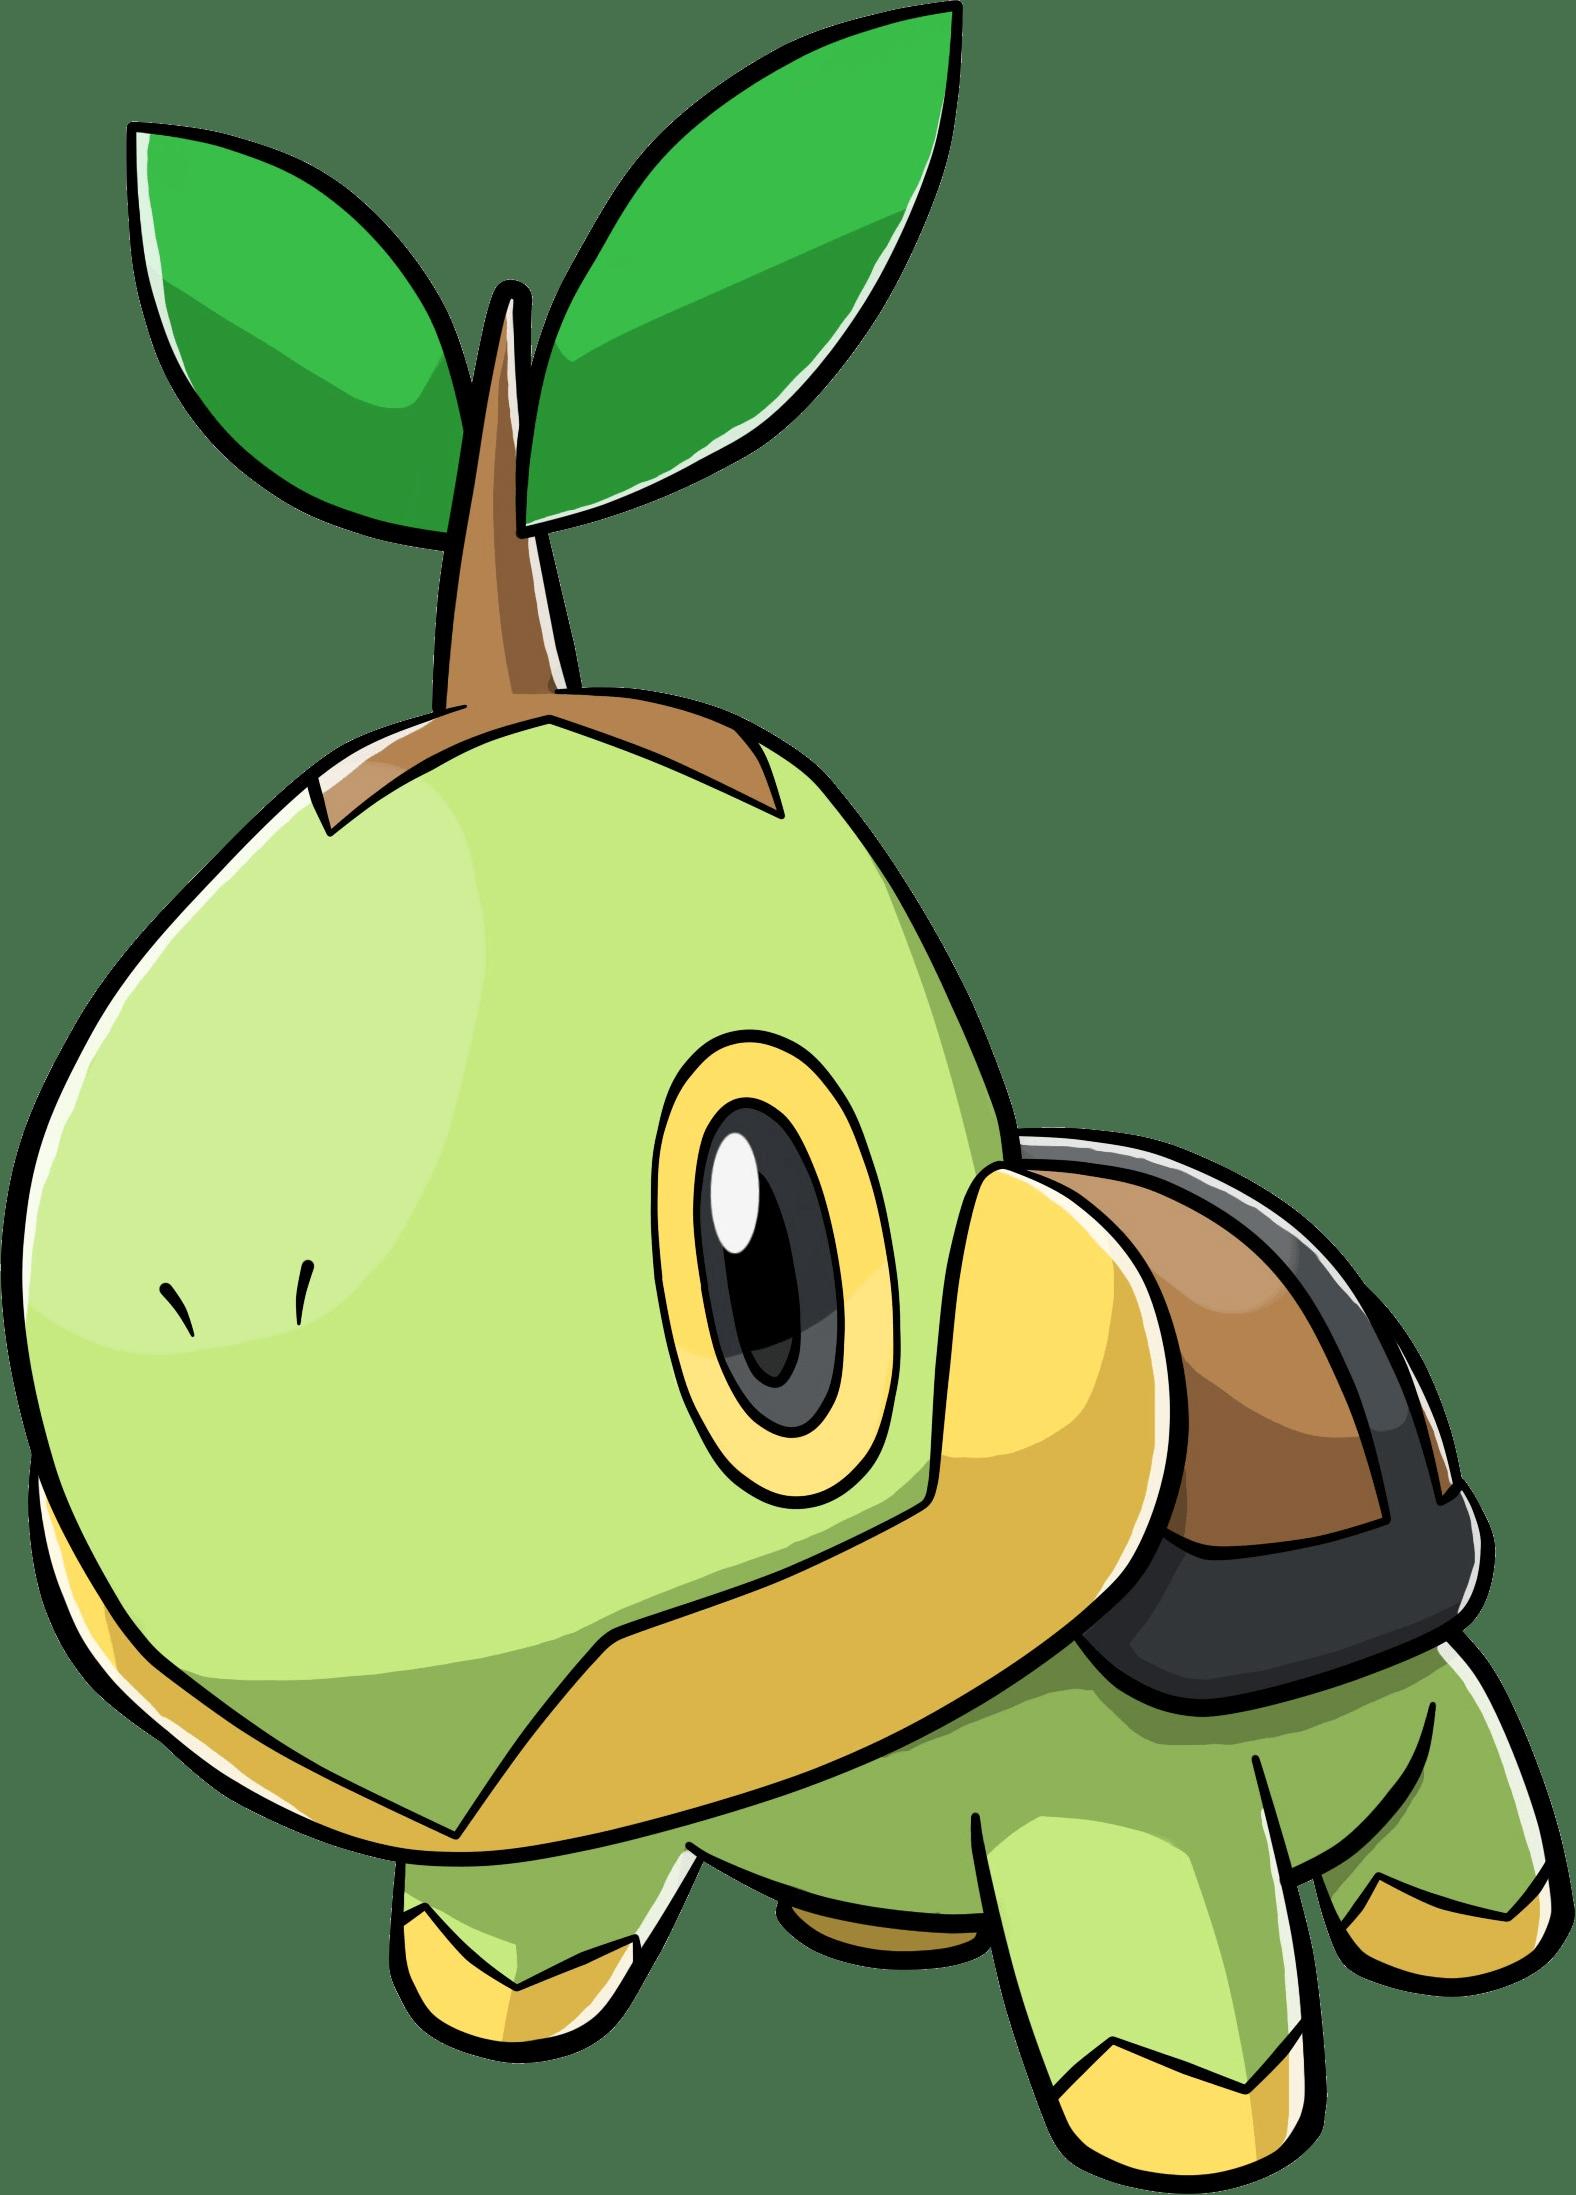 Typhlosion Pokemon transparent PNG.